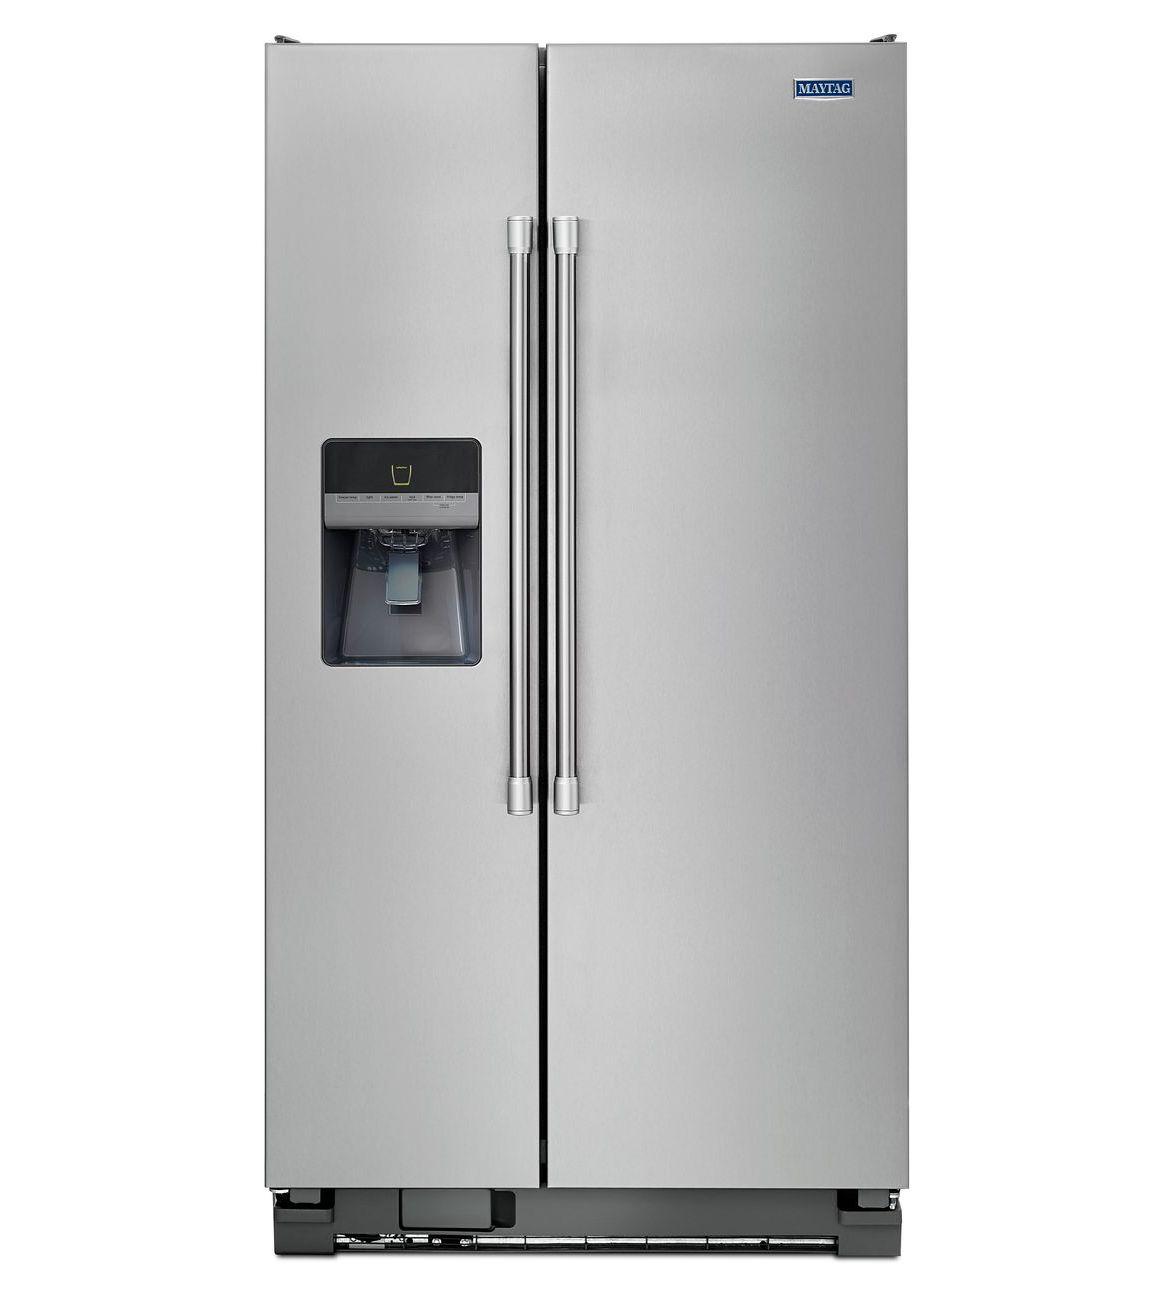 Maytag refrigerator deals